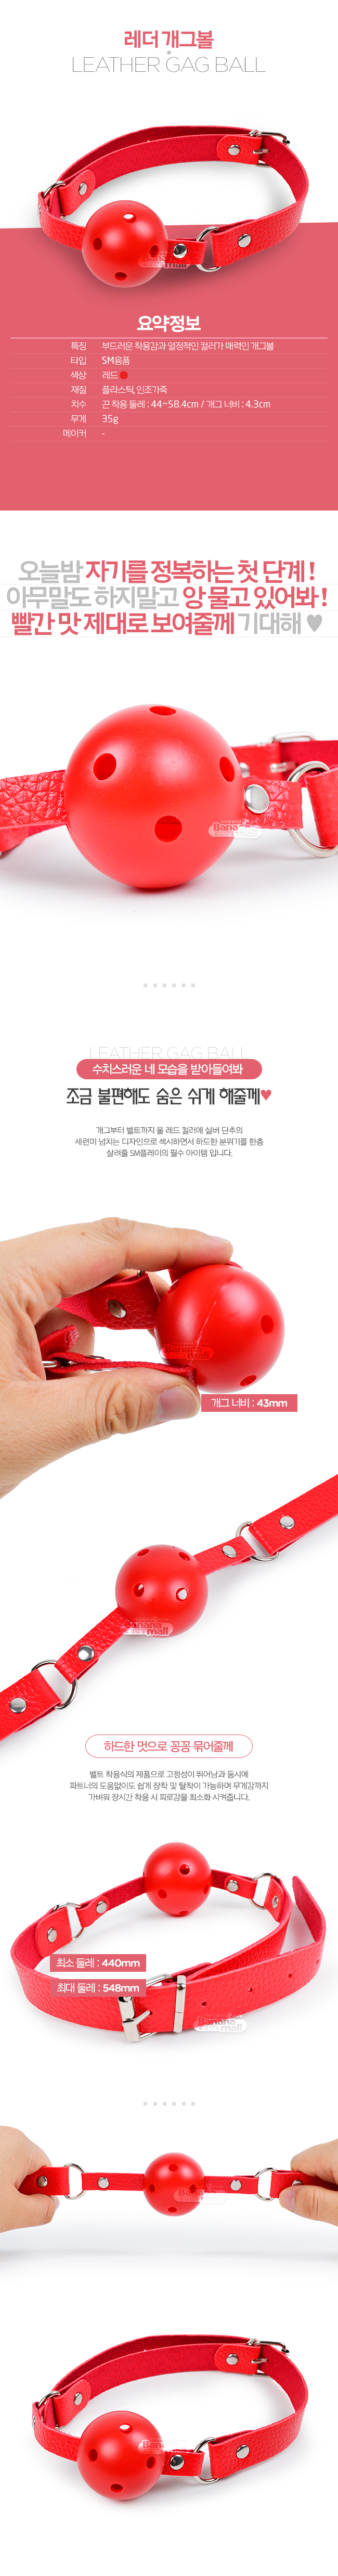 [SM 플레이] 레더 개그볼(Leather Gag Ball) (JBG)